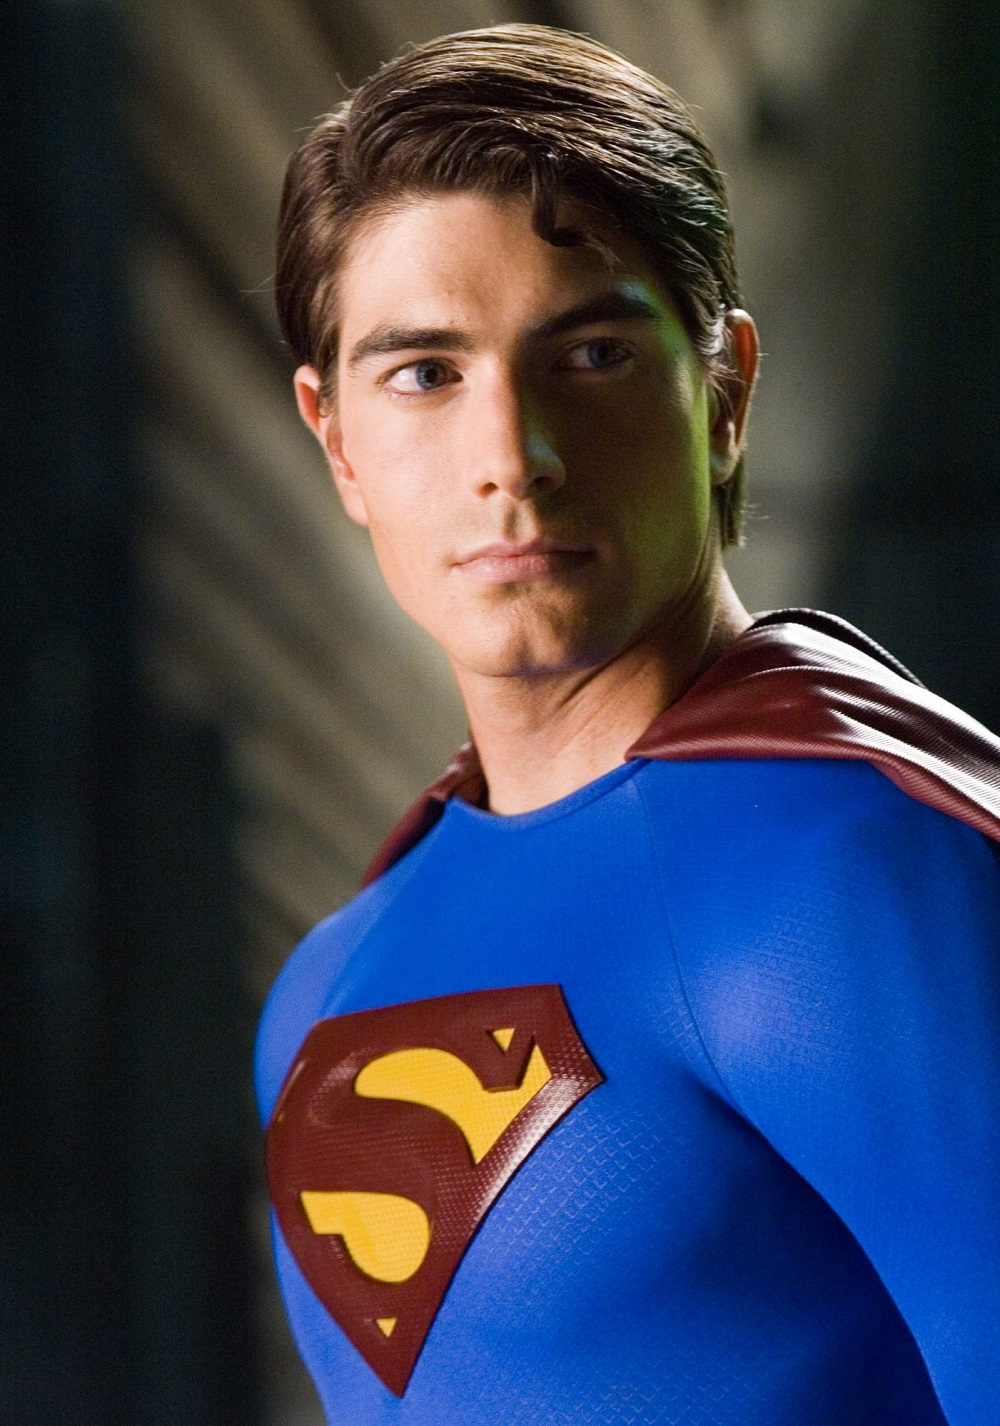 Brandon Routh como Superman en Superman Returns (2006). Imagen: fanart.tv